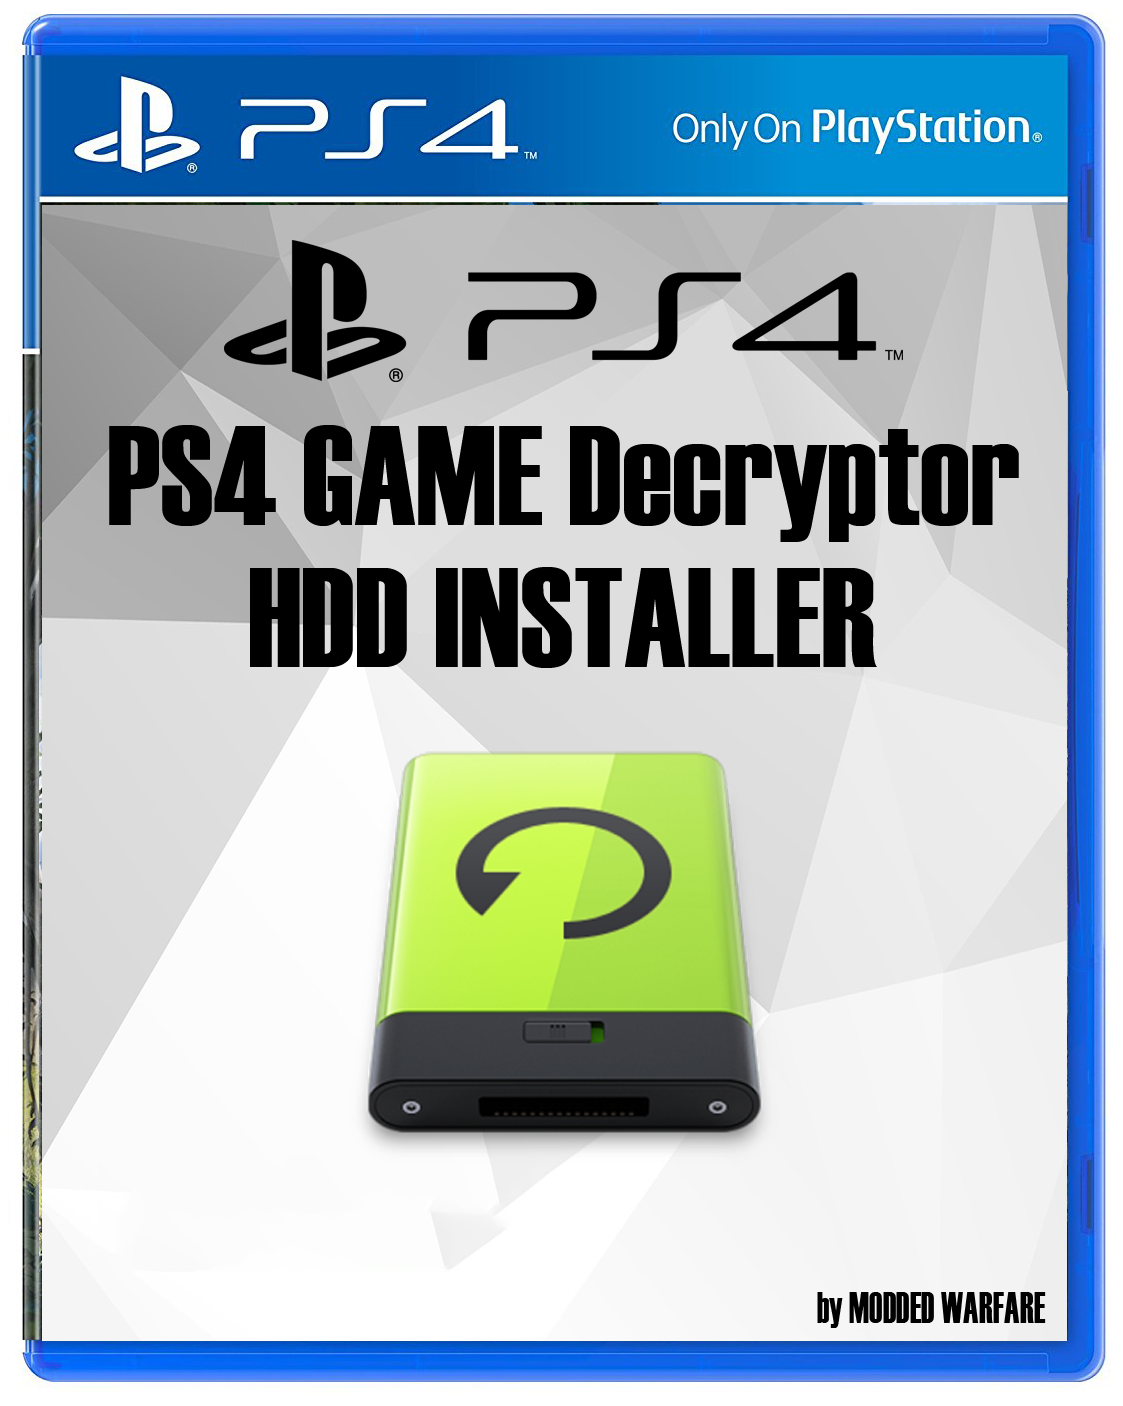 Ps4 games pkg cfw downloads   PS4 Fake PKG Tool  2019-08-01